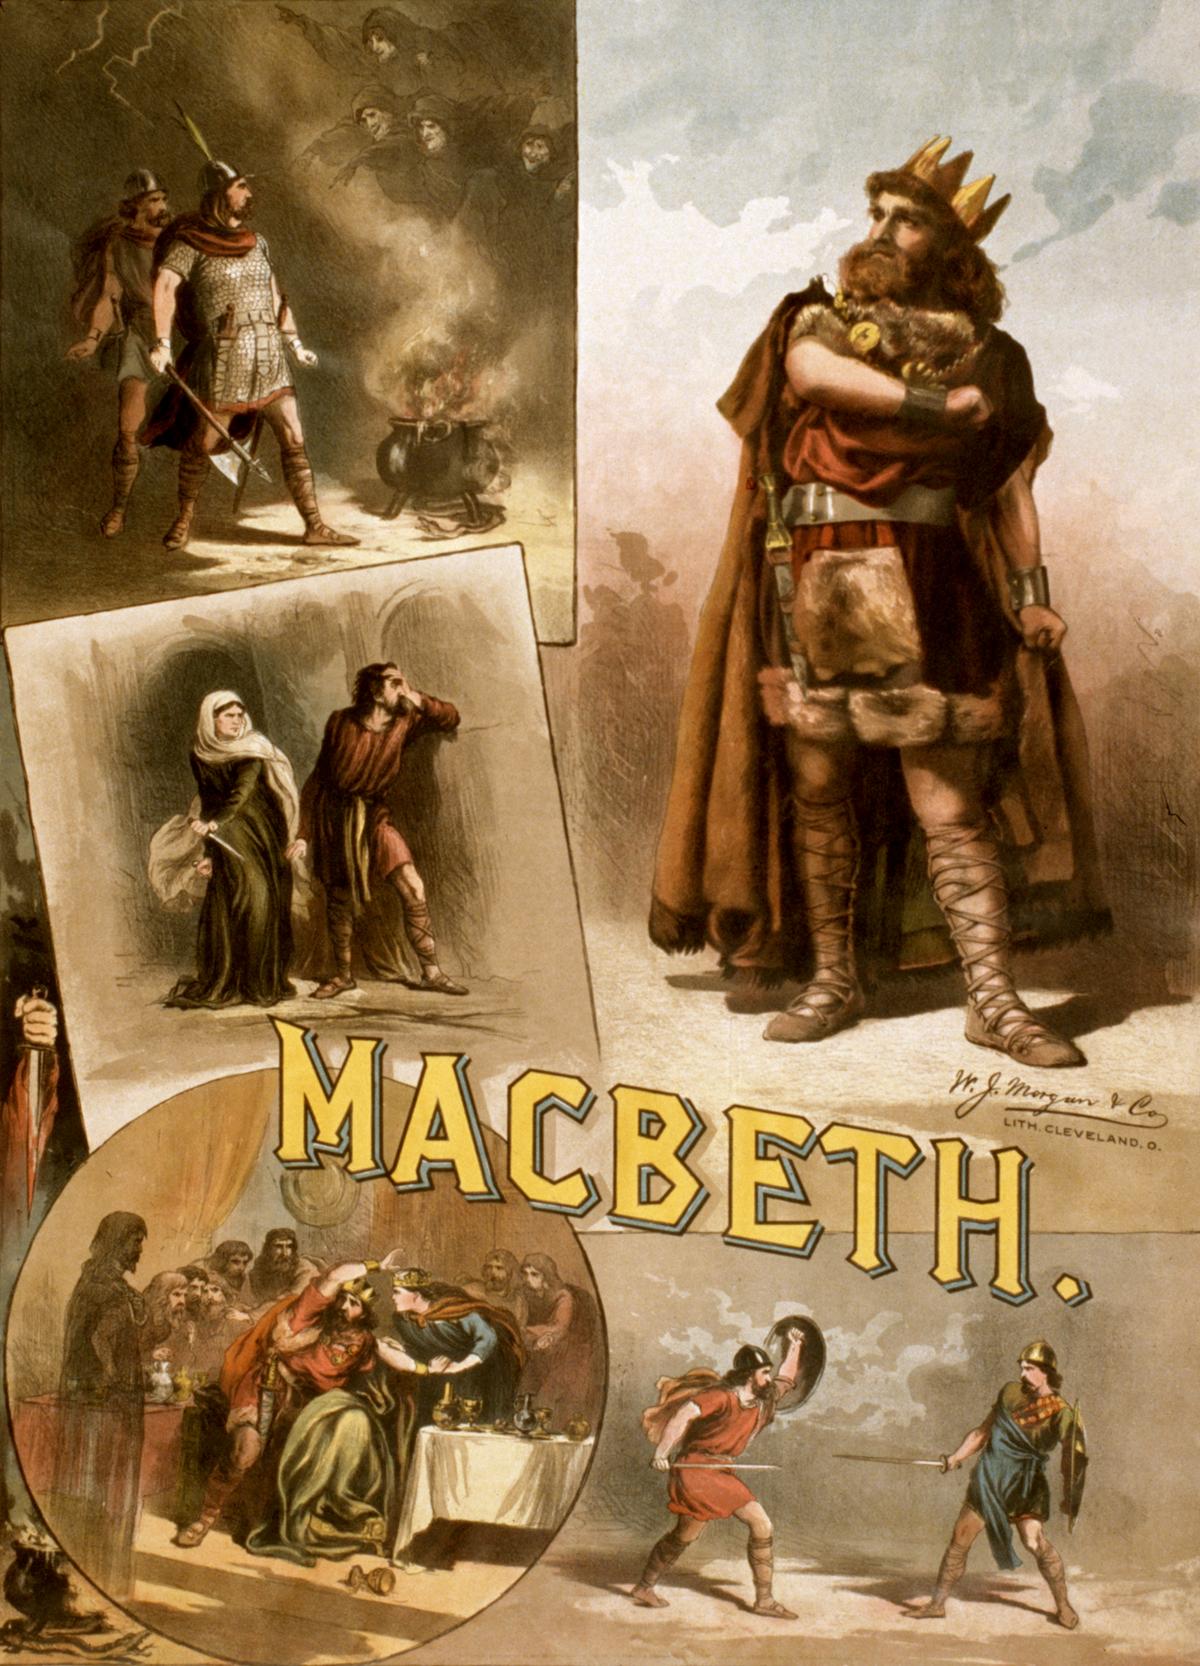 Thomas Keene in Macbeth 1884 Wikipedia crop.png